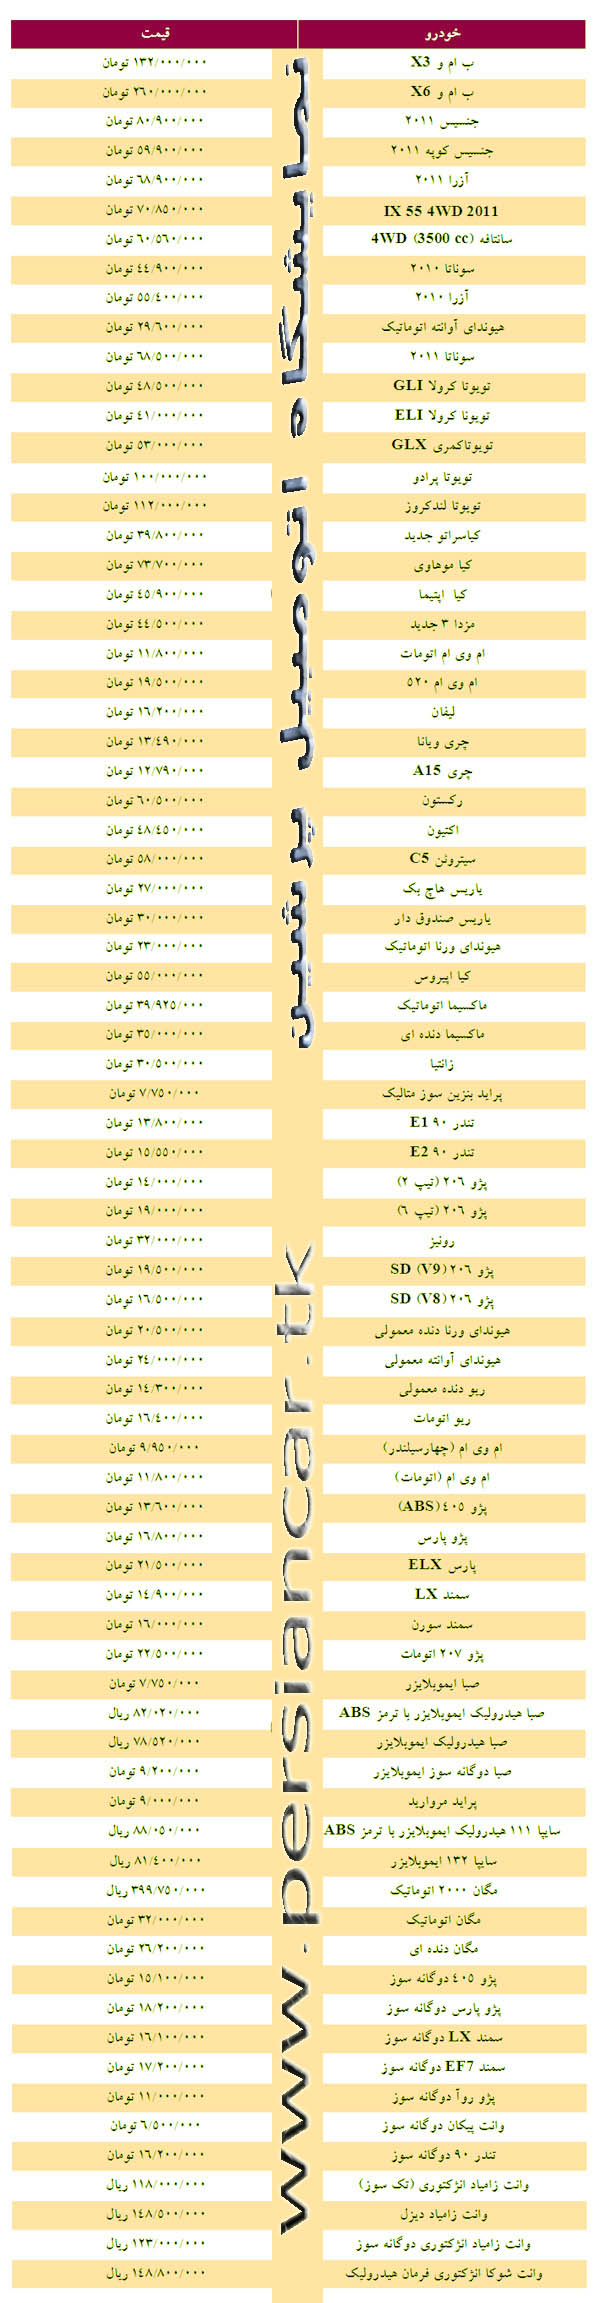 gheymate hyundai in iran